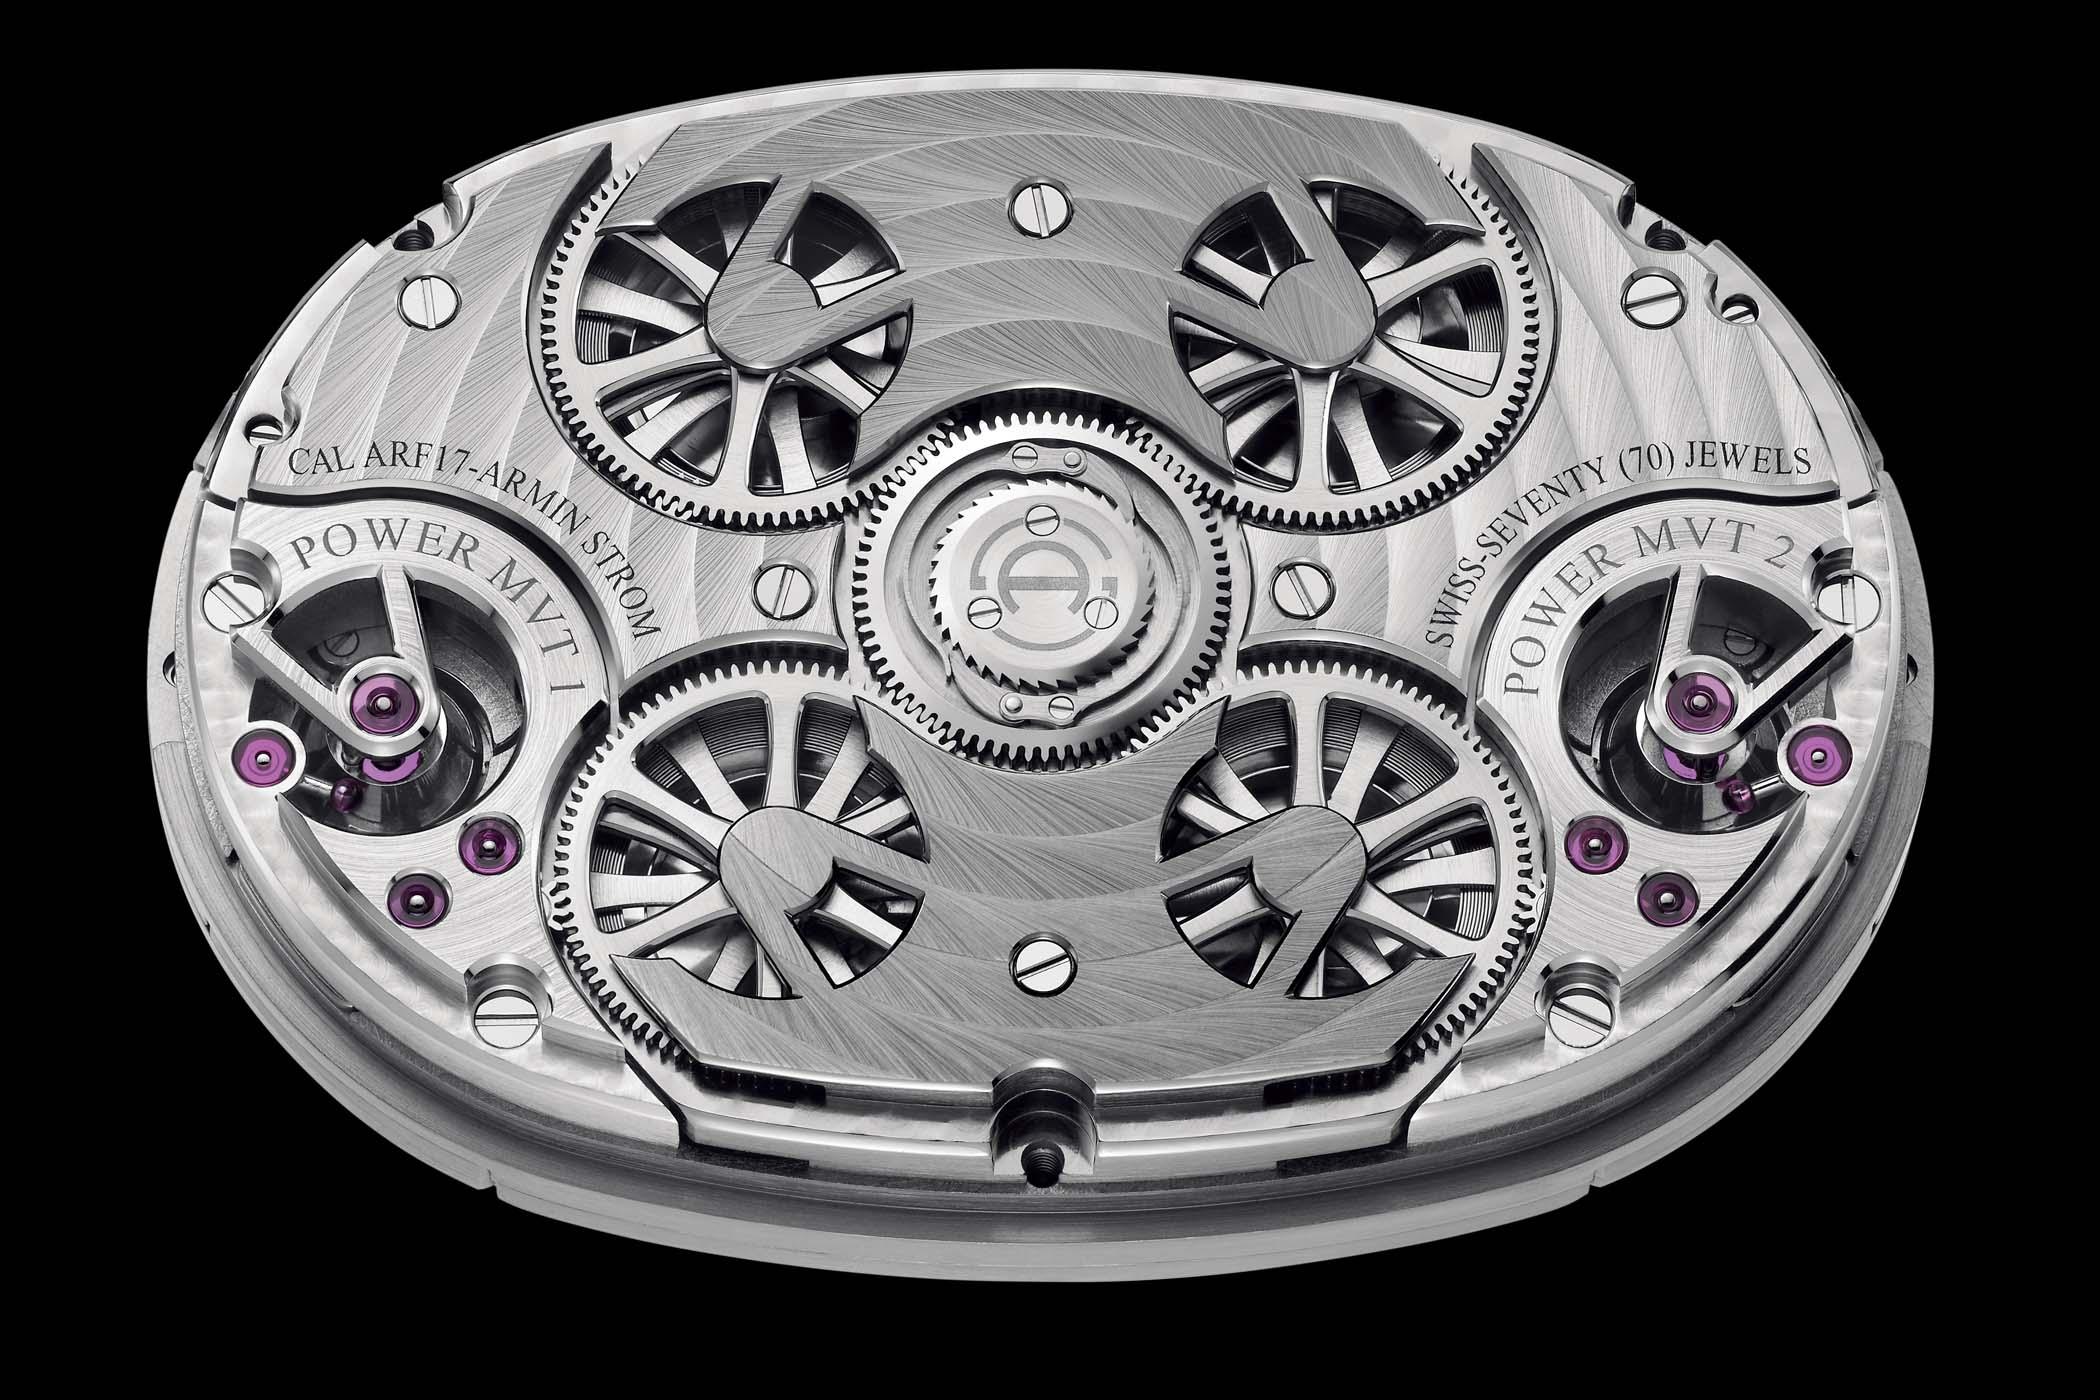 Armin Strom Dual Time Resonance Sapphire SIHH 2019 - 3